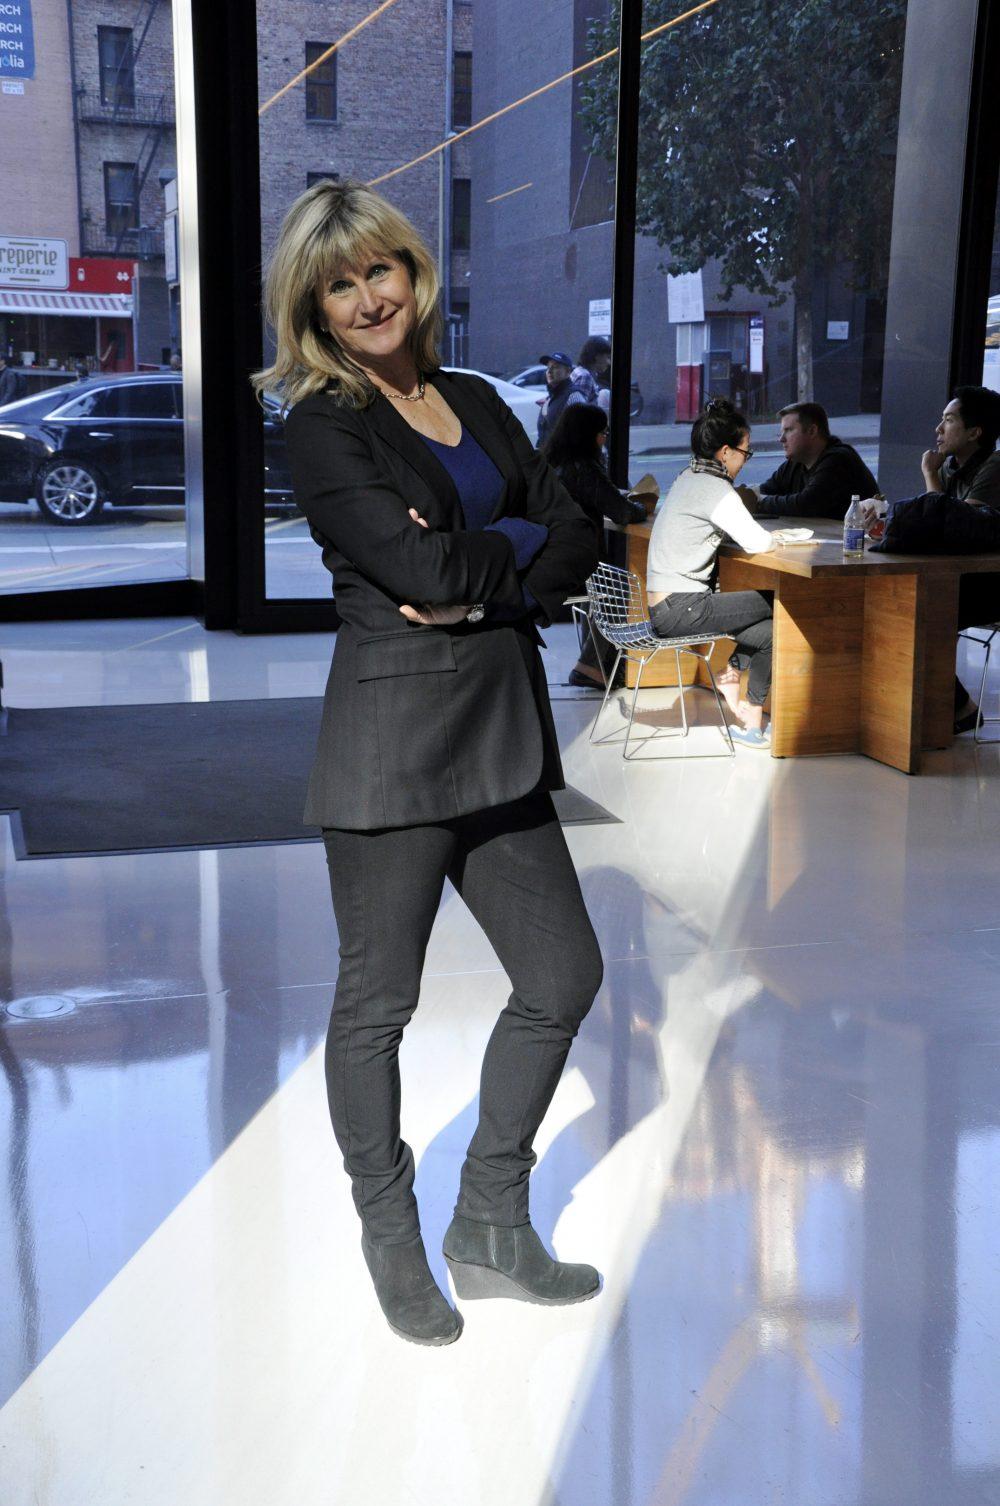 Marion McGovern Linkedin profile image